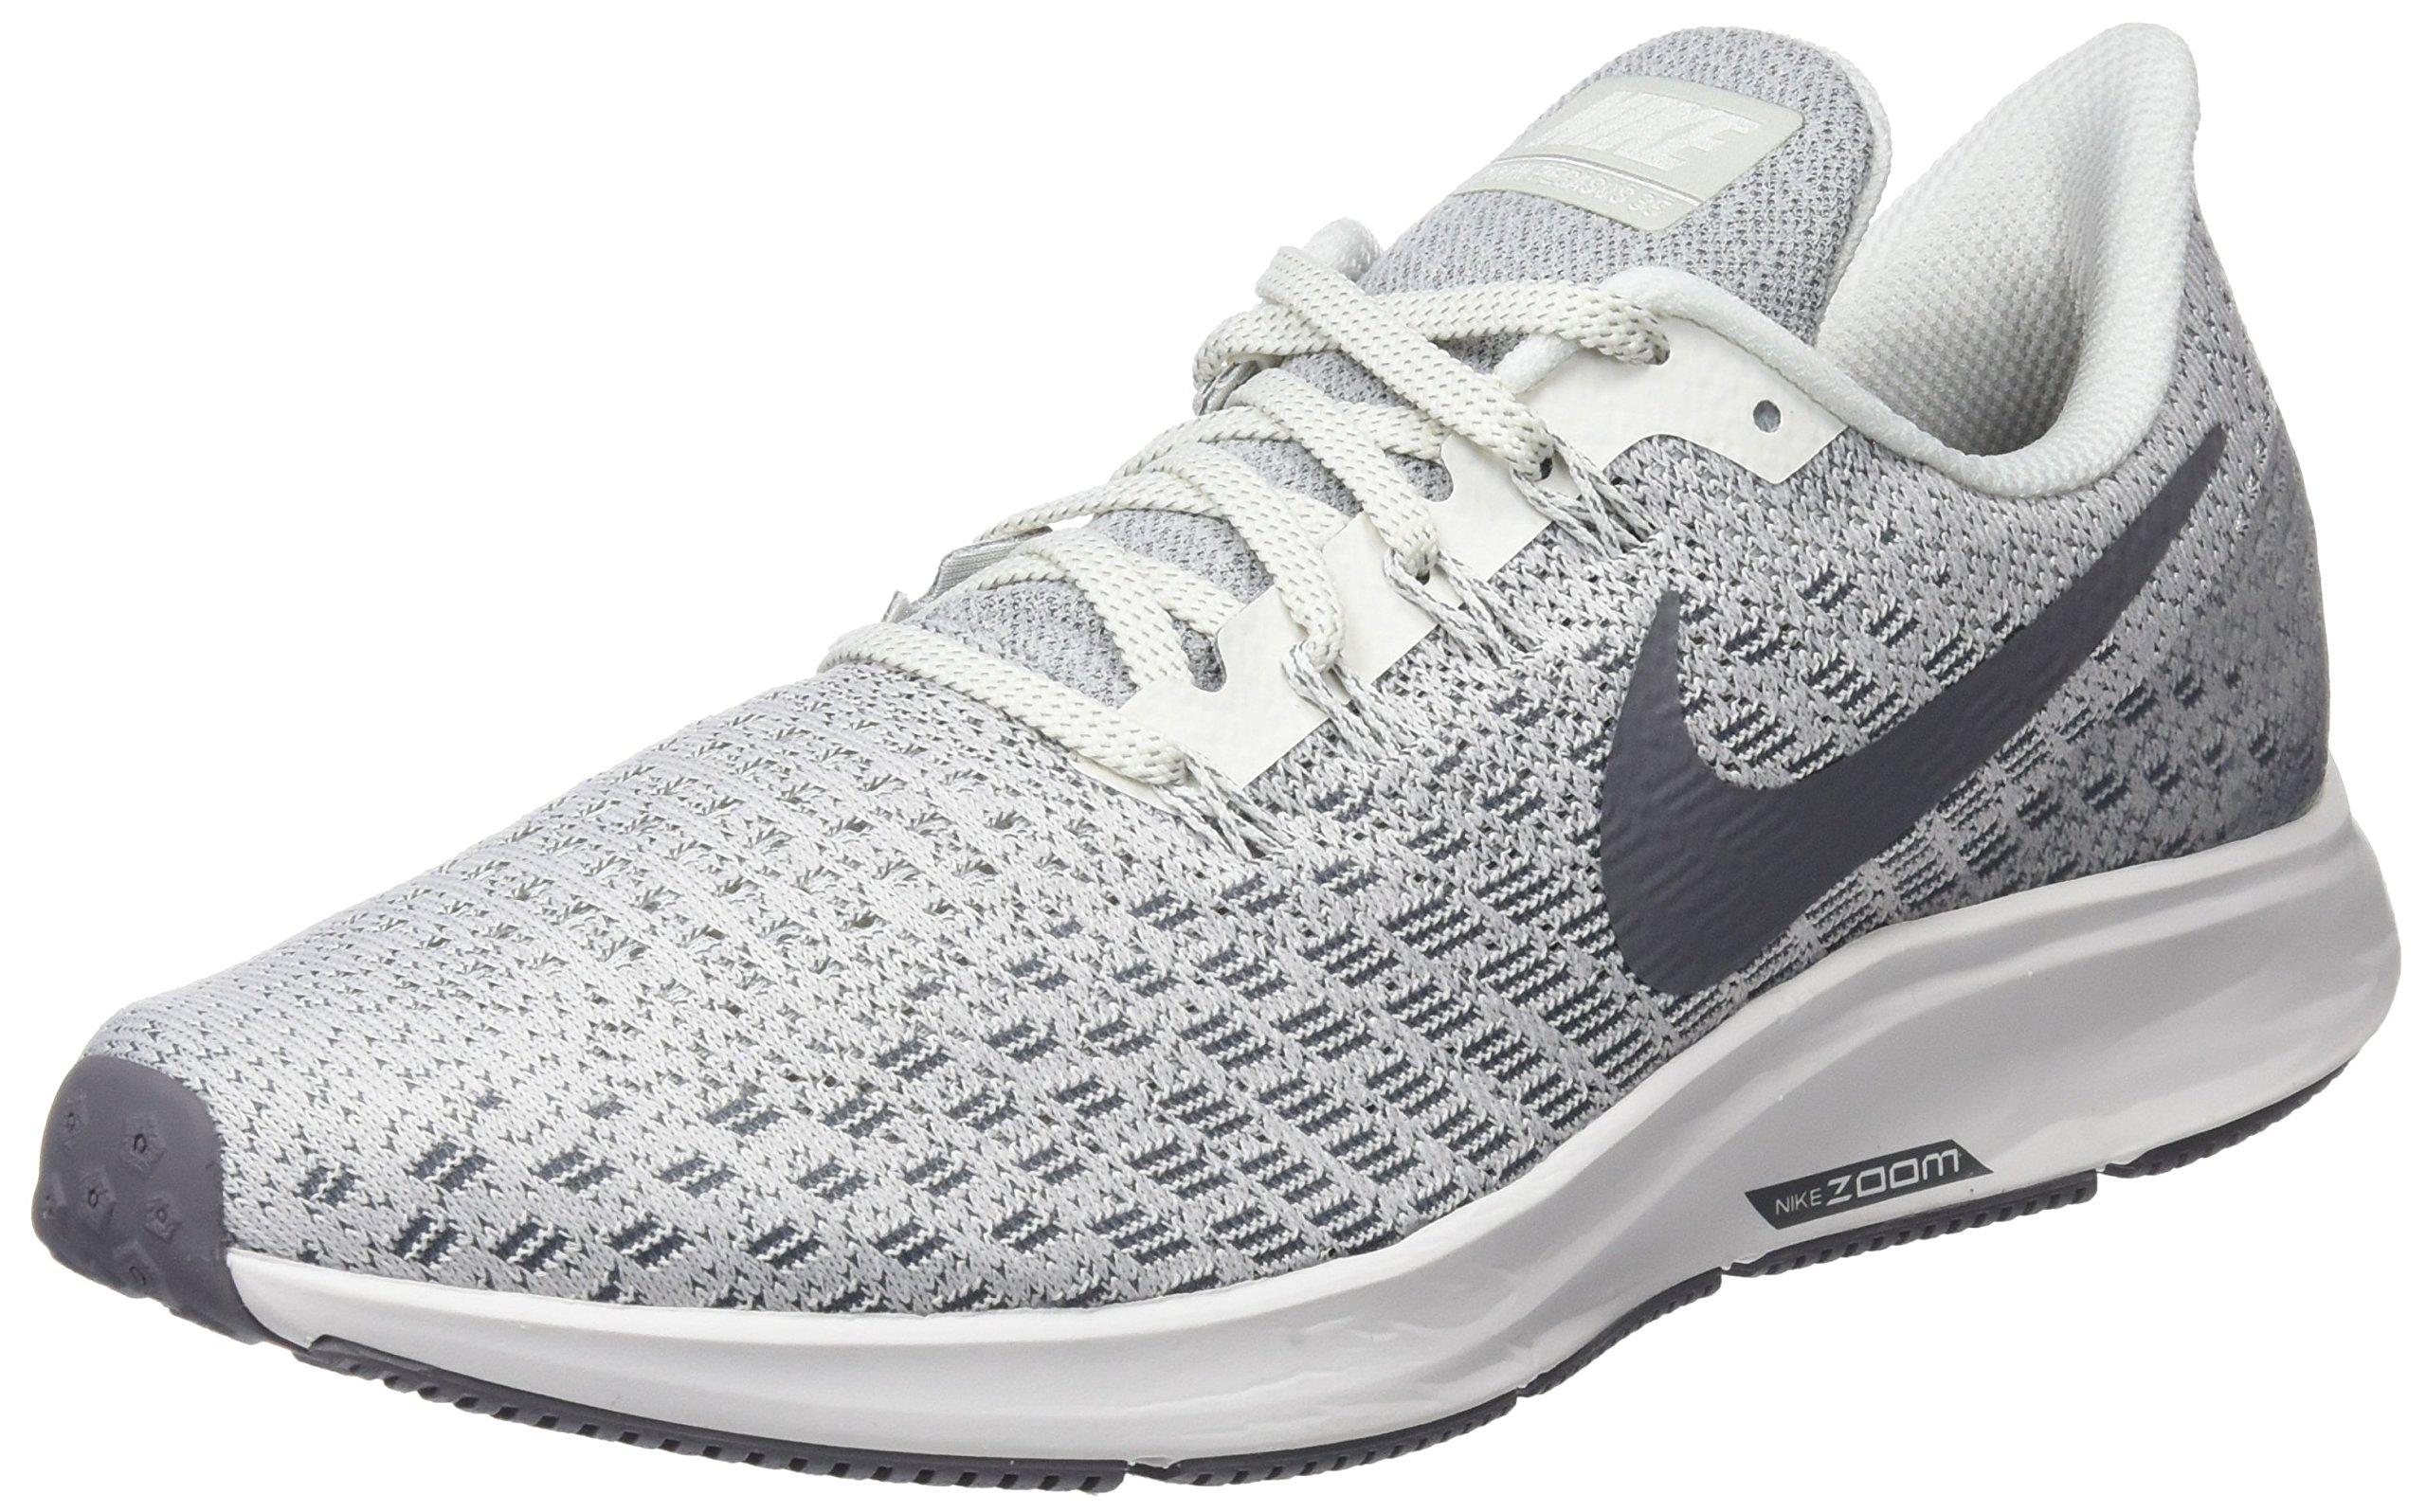 Nike Air Zoom Pegasus 35 Mens 942851-004 Size 6.5 by Nike (Image #1)